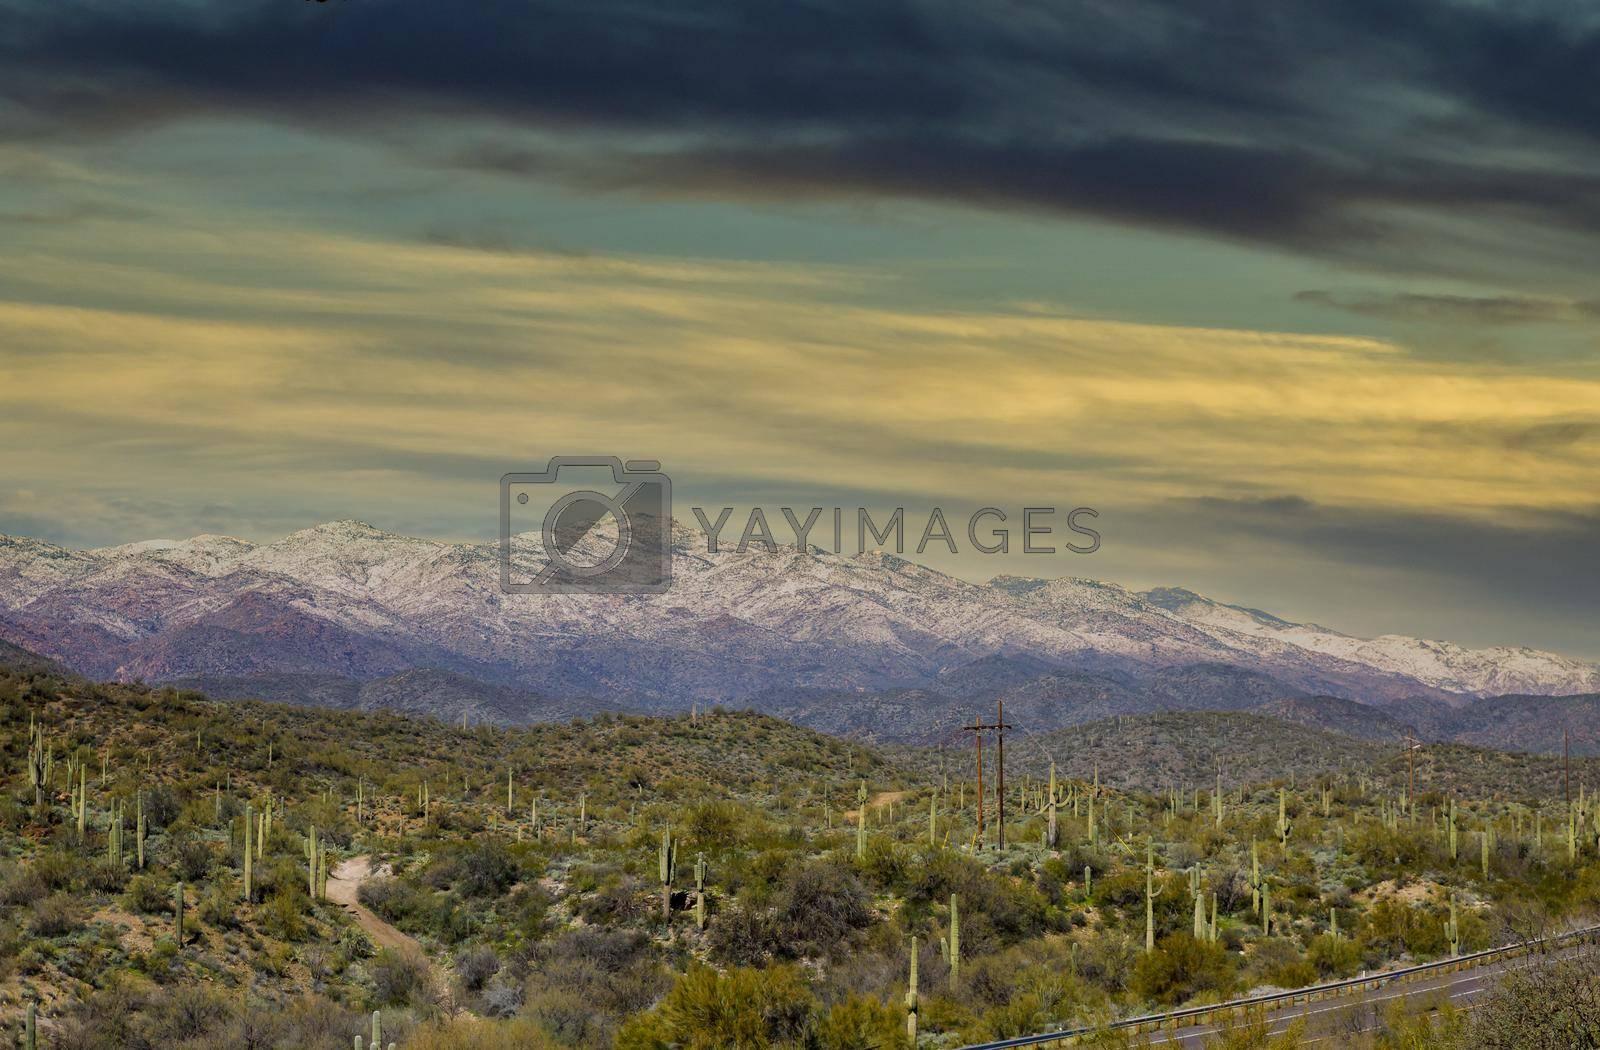 Arizona desert landscape with saguaro cactus at sunset with snow covered mountains near Phoenix, Arizona